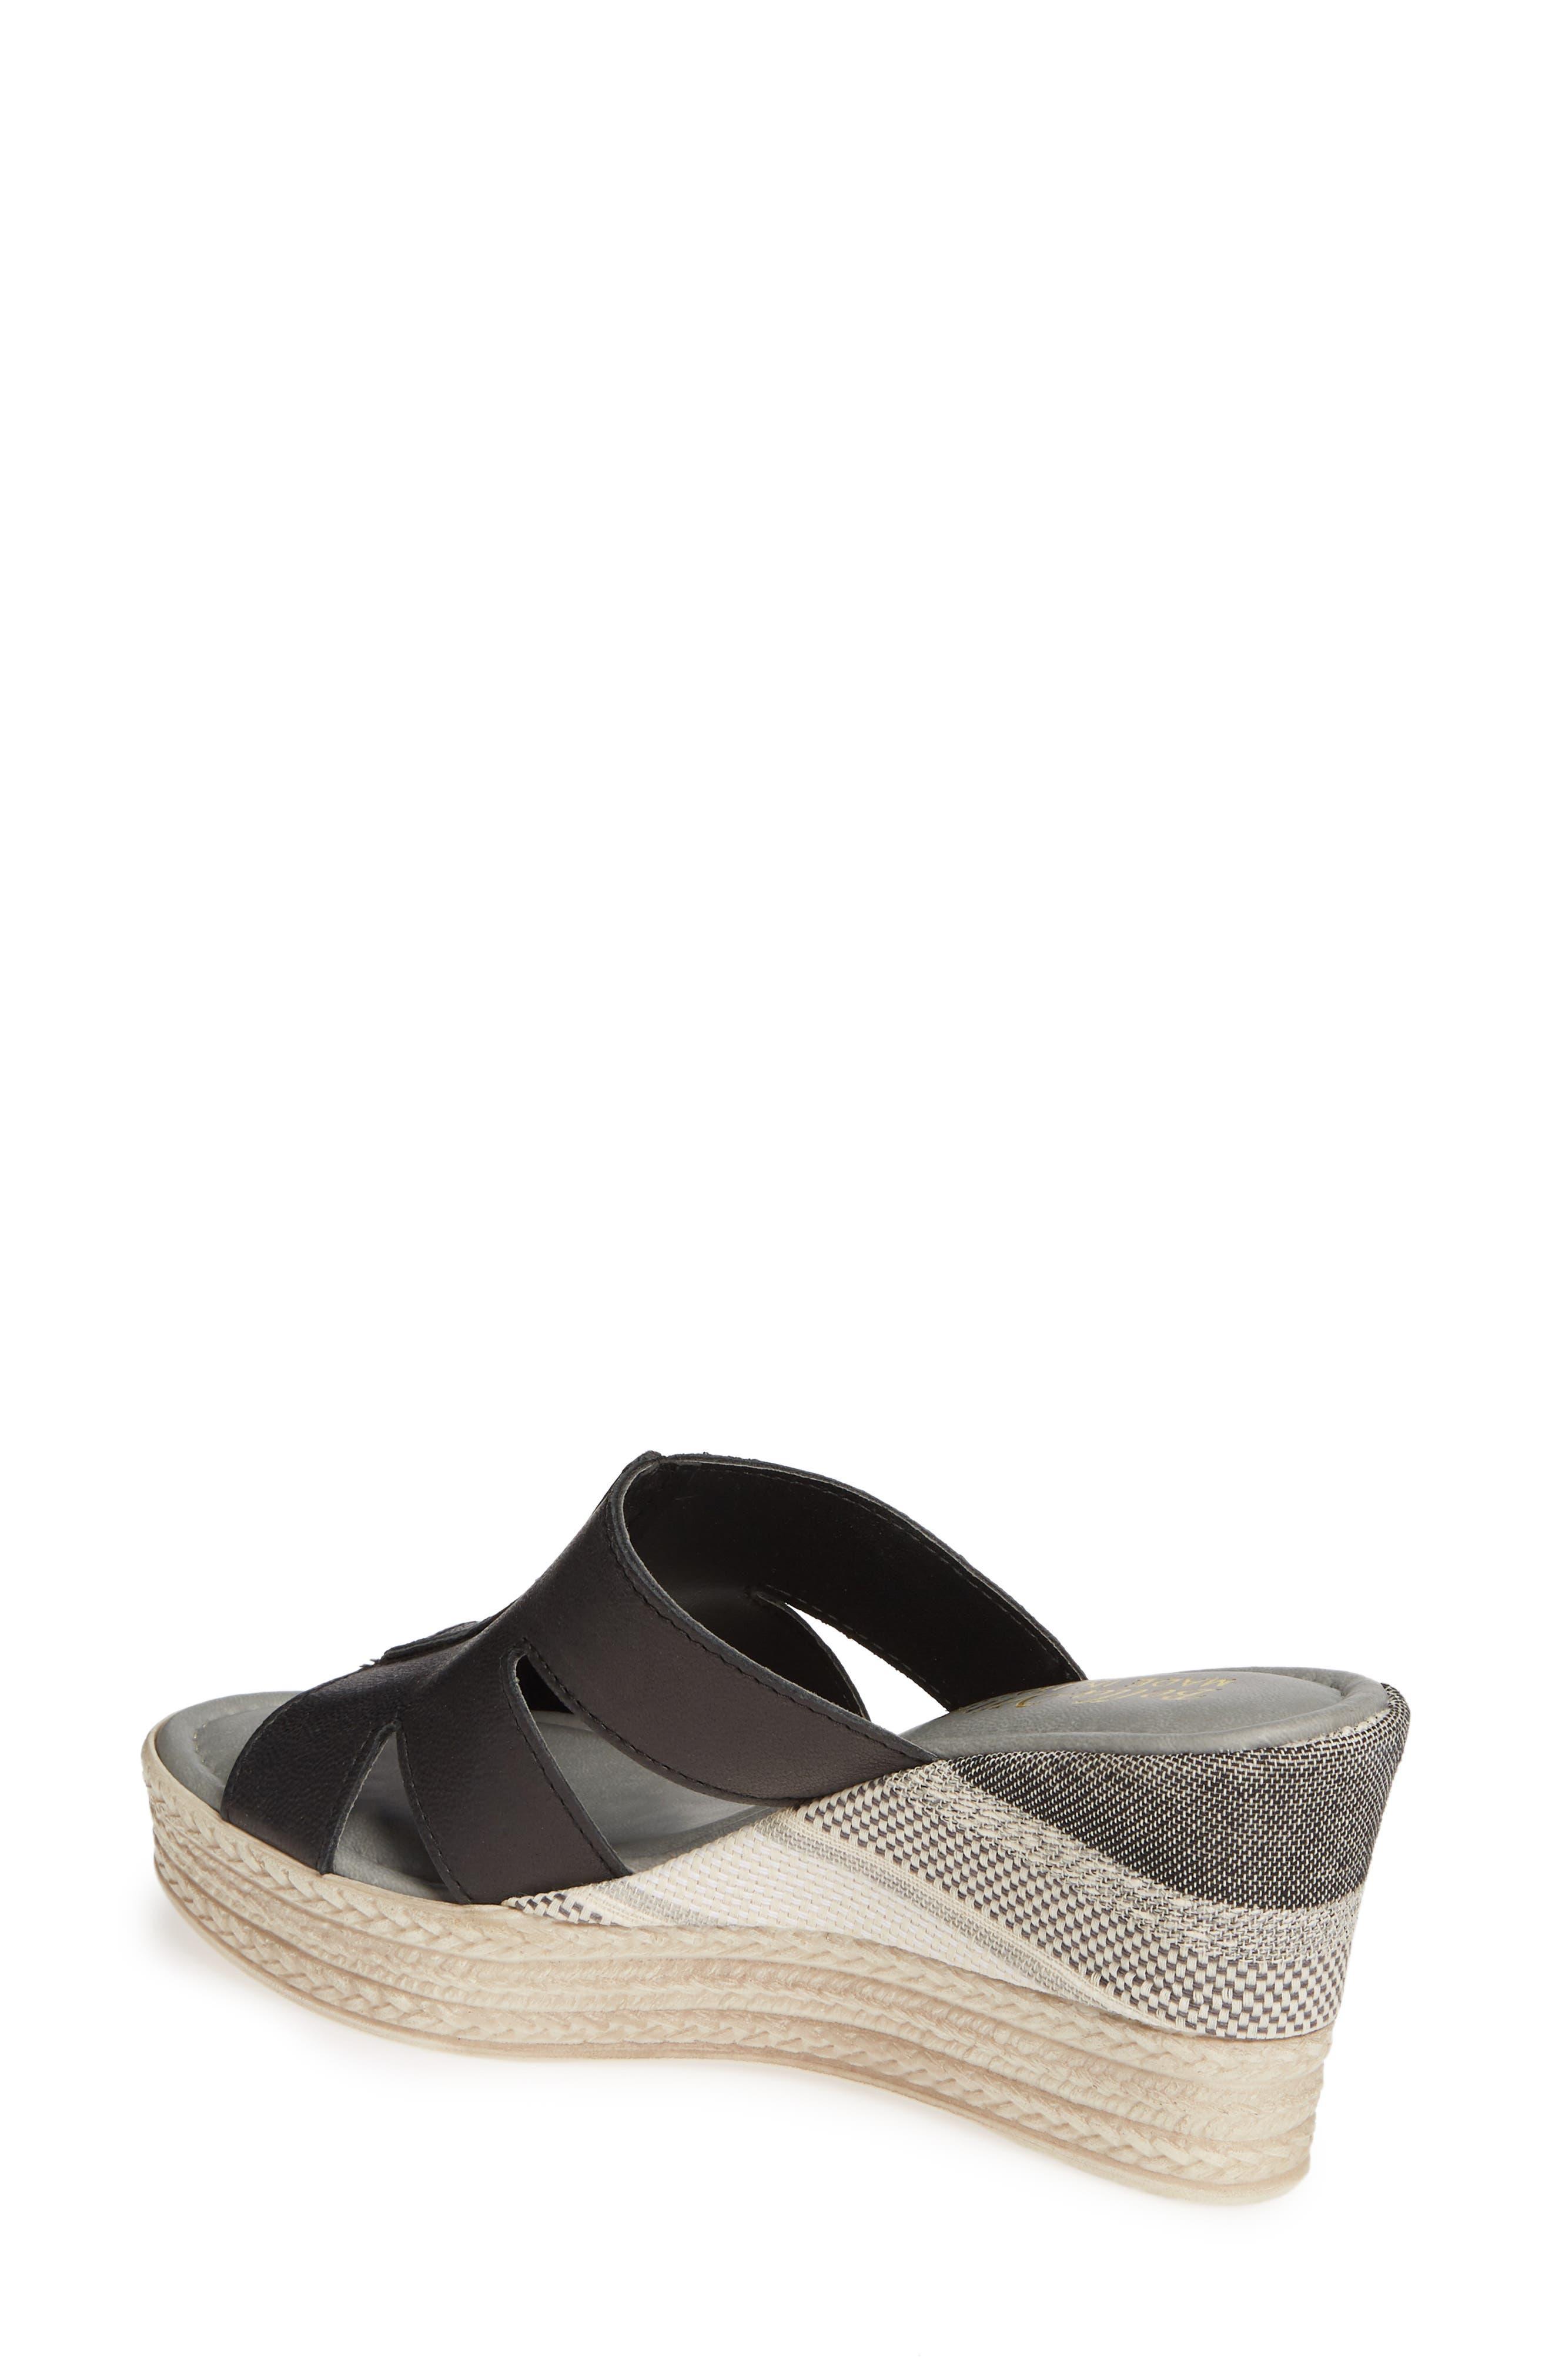 BELLA VITA, Rox Wedge Slide Sandal, Alternate thumbnail 2, color, BLACK ITALIAN LEATHER